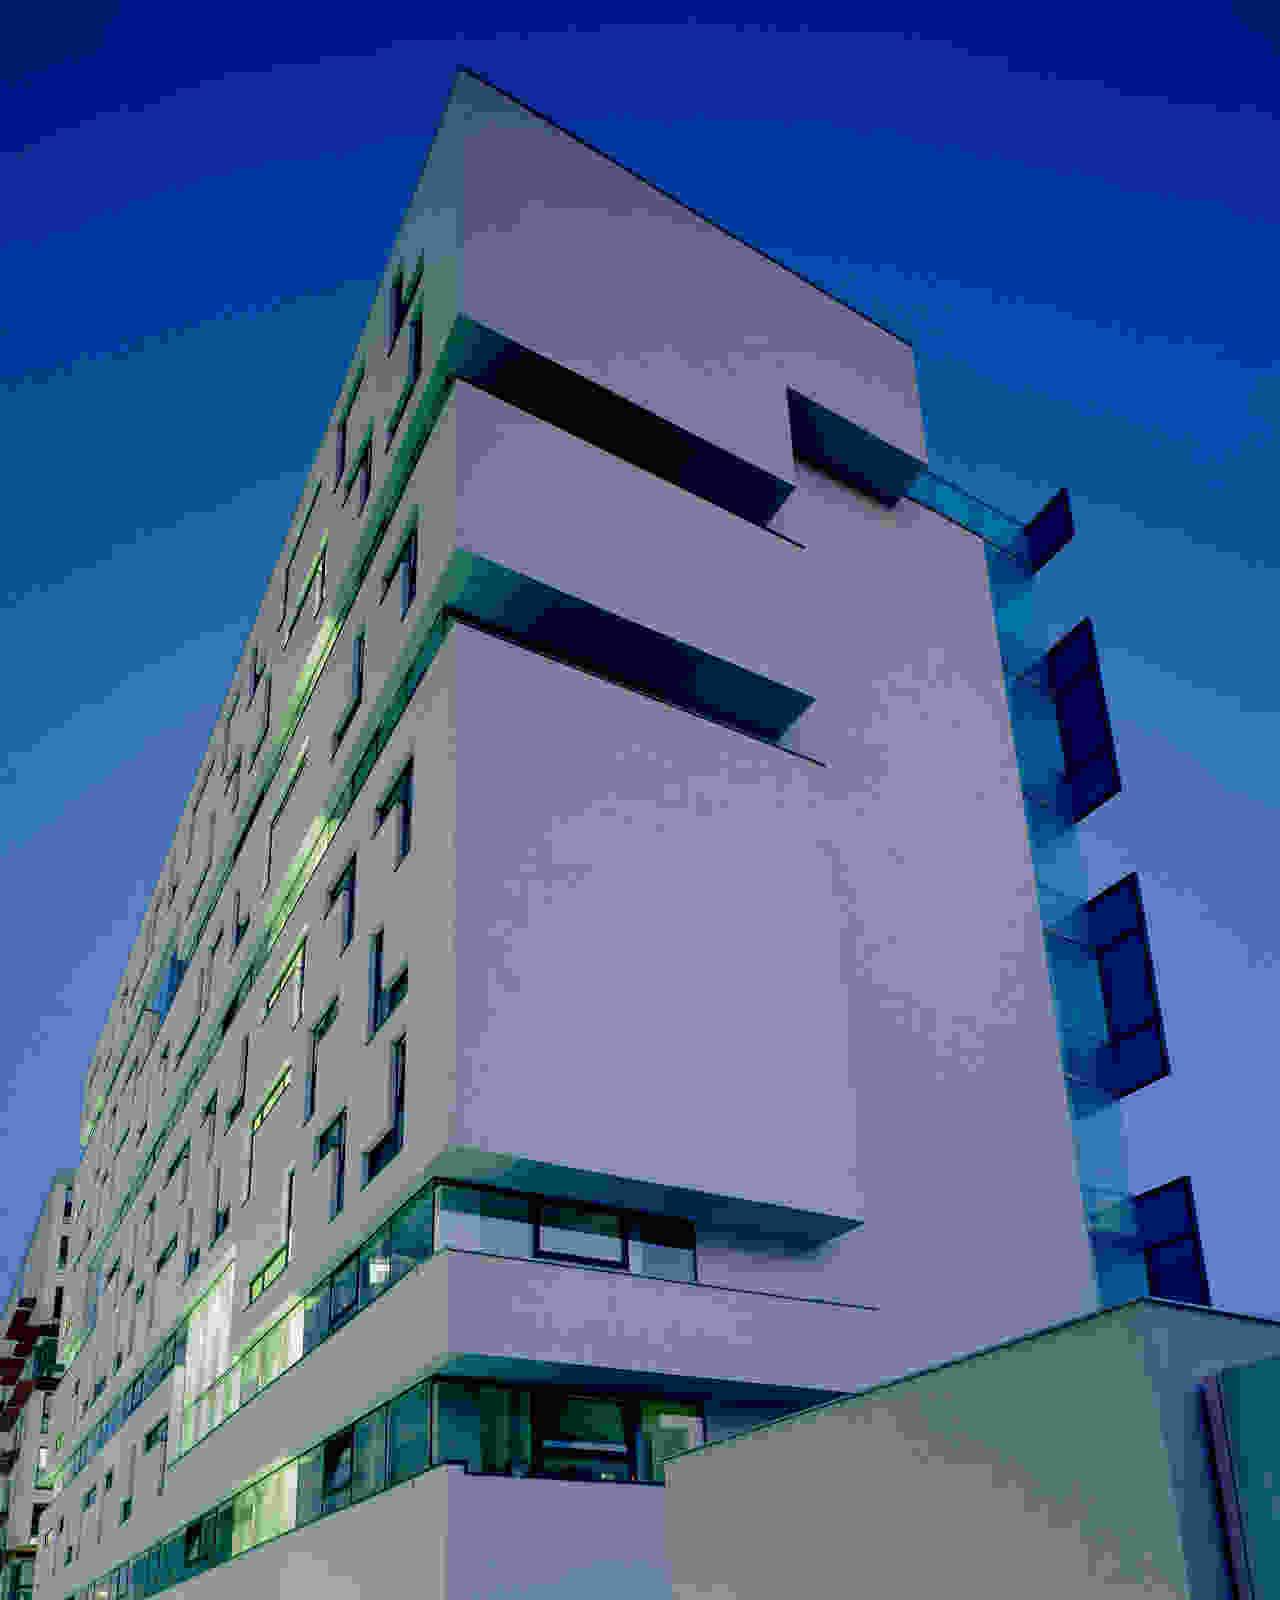 038 city lofts wienerberg Herta Hurnaus 021 exterior